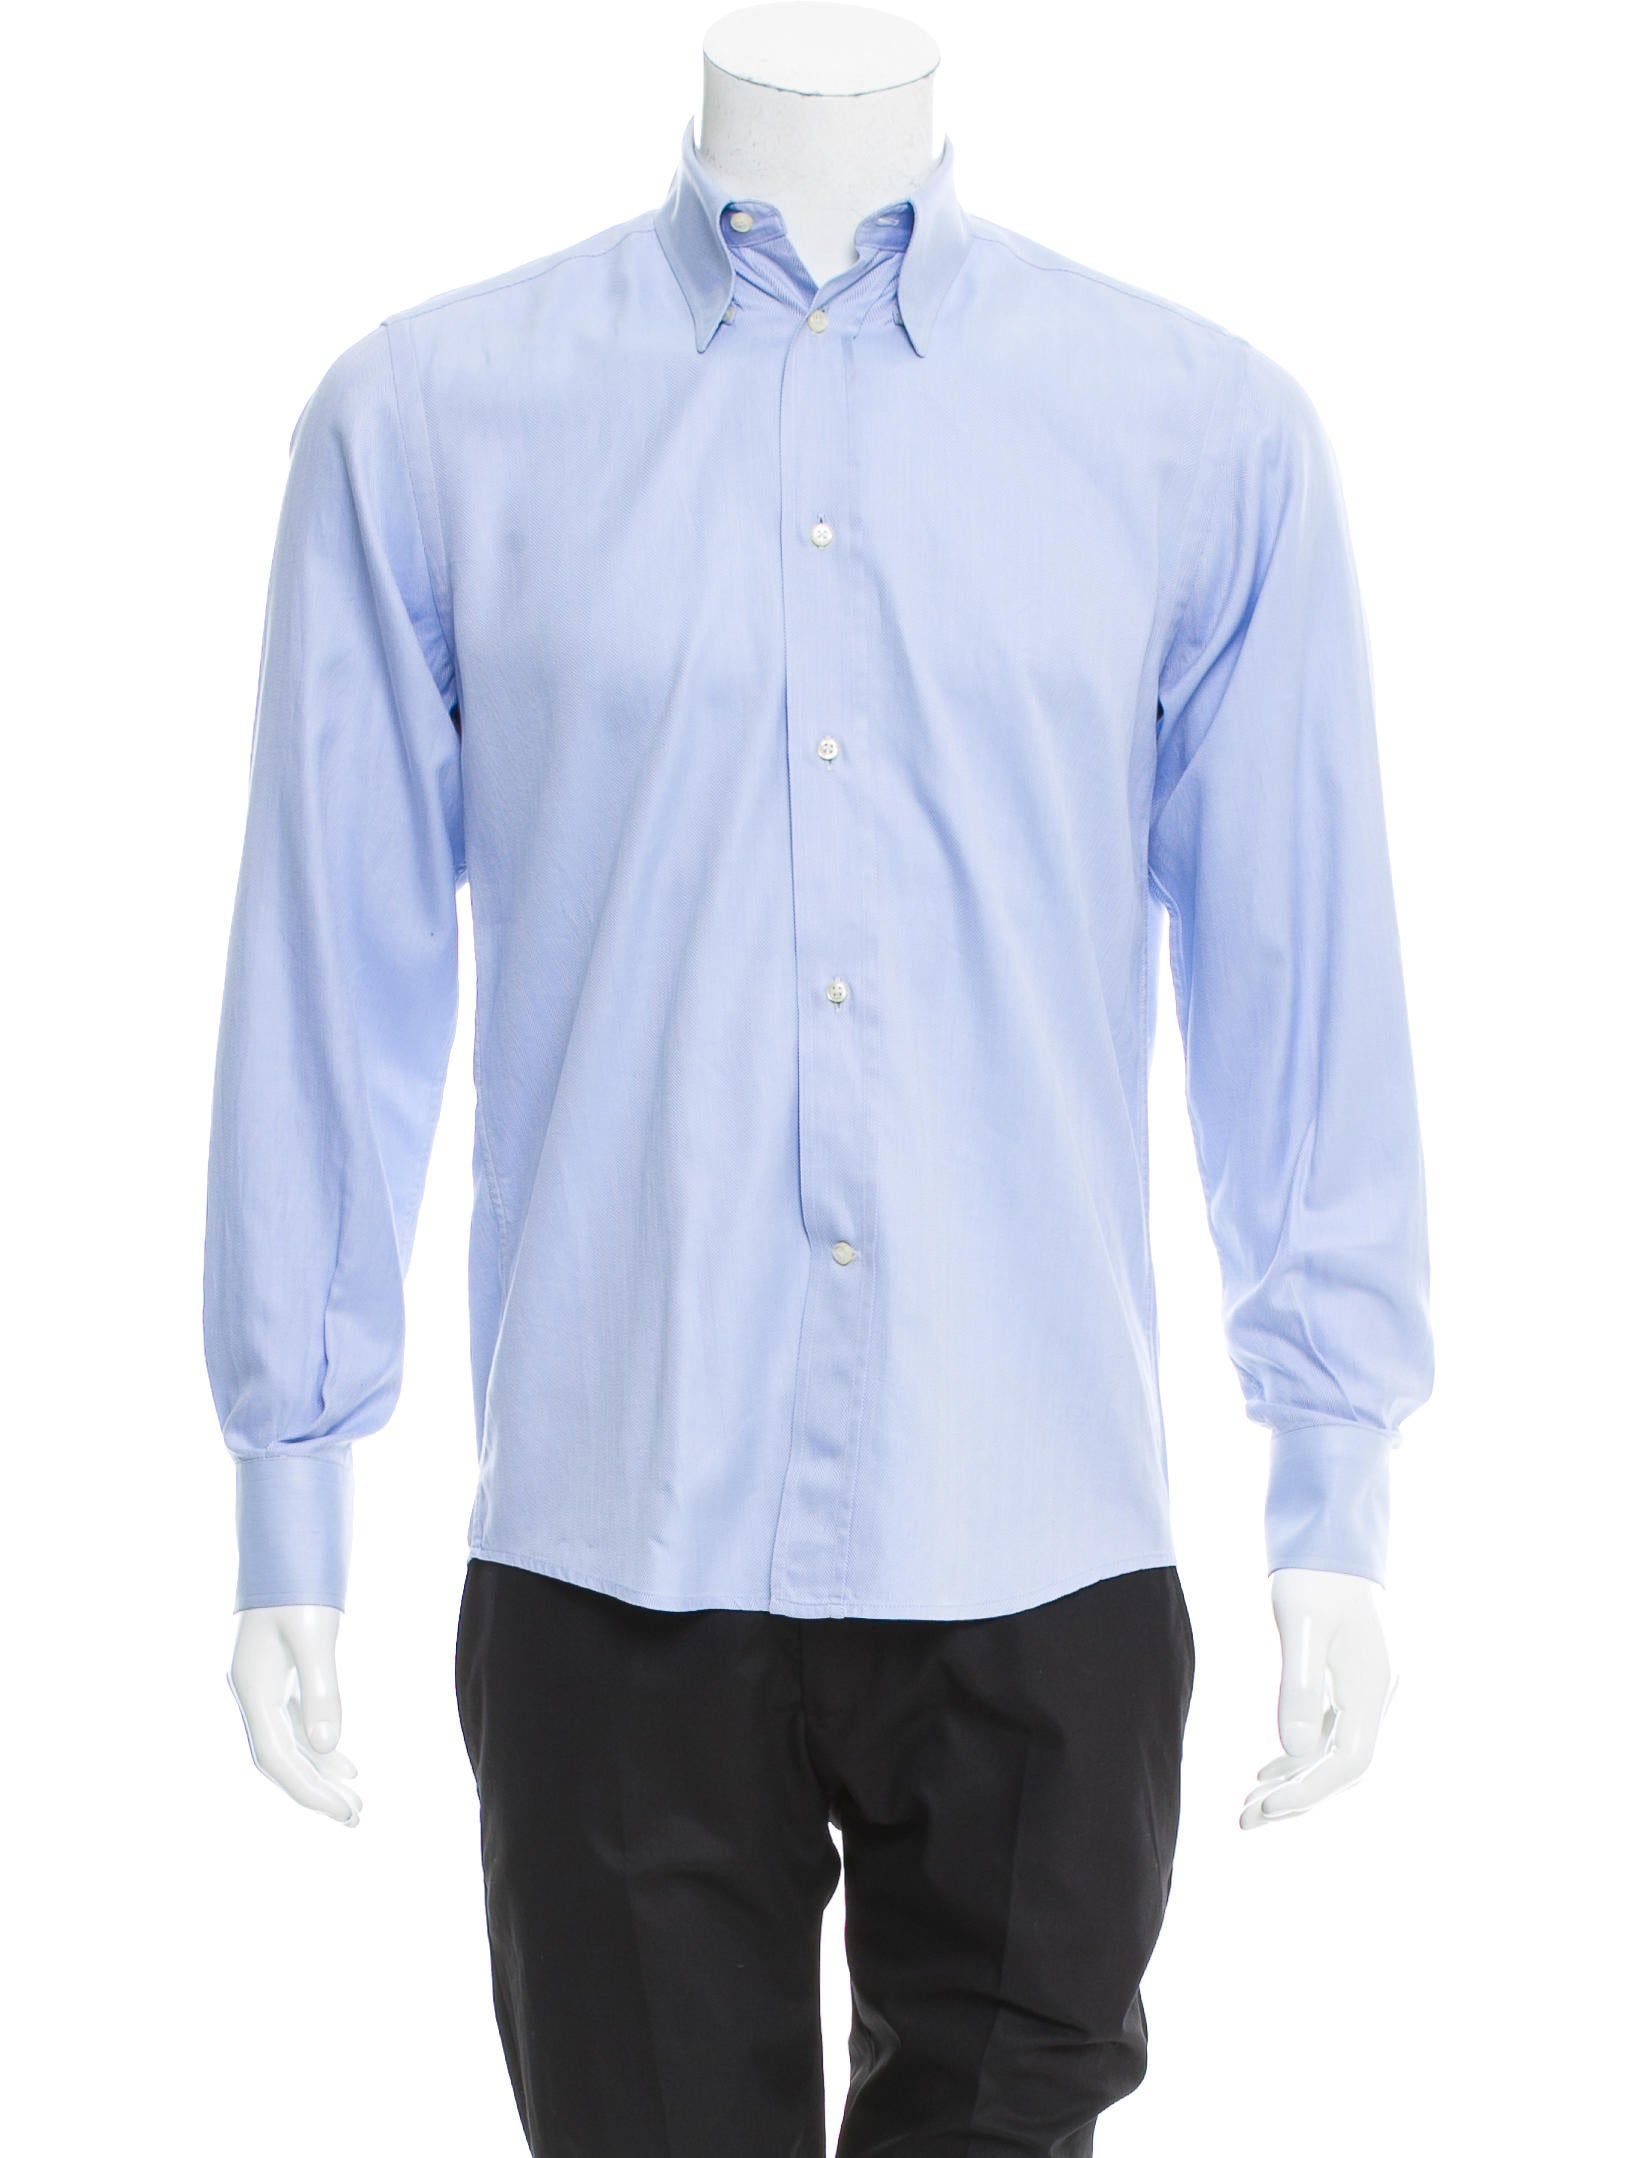 Yves saint laurent herringbone button up shirt clothing for Yves saint laurent logo shirt